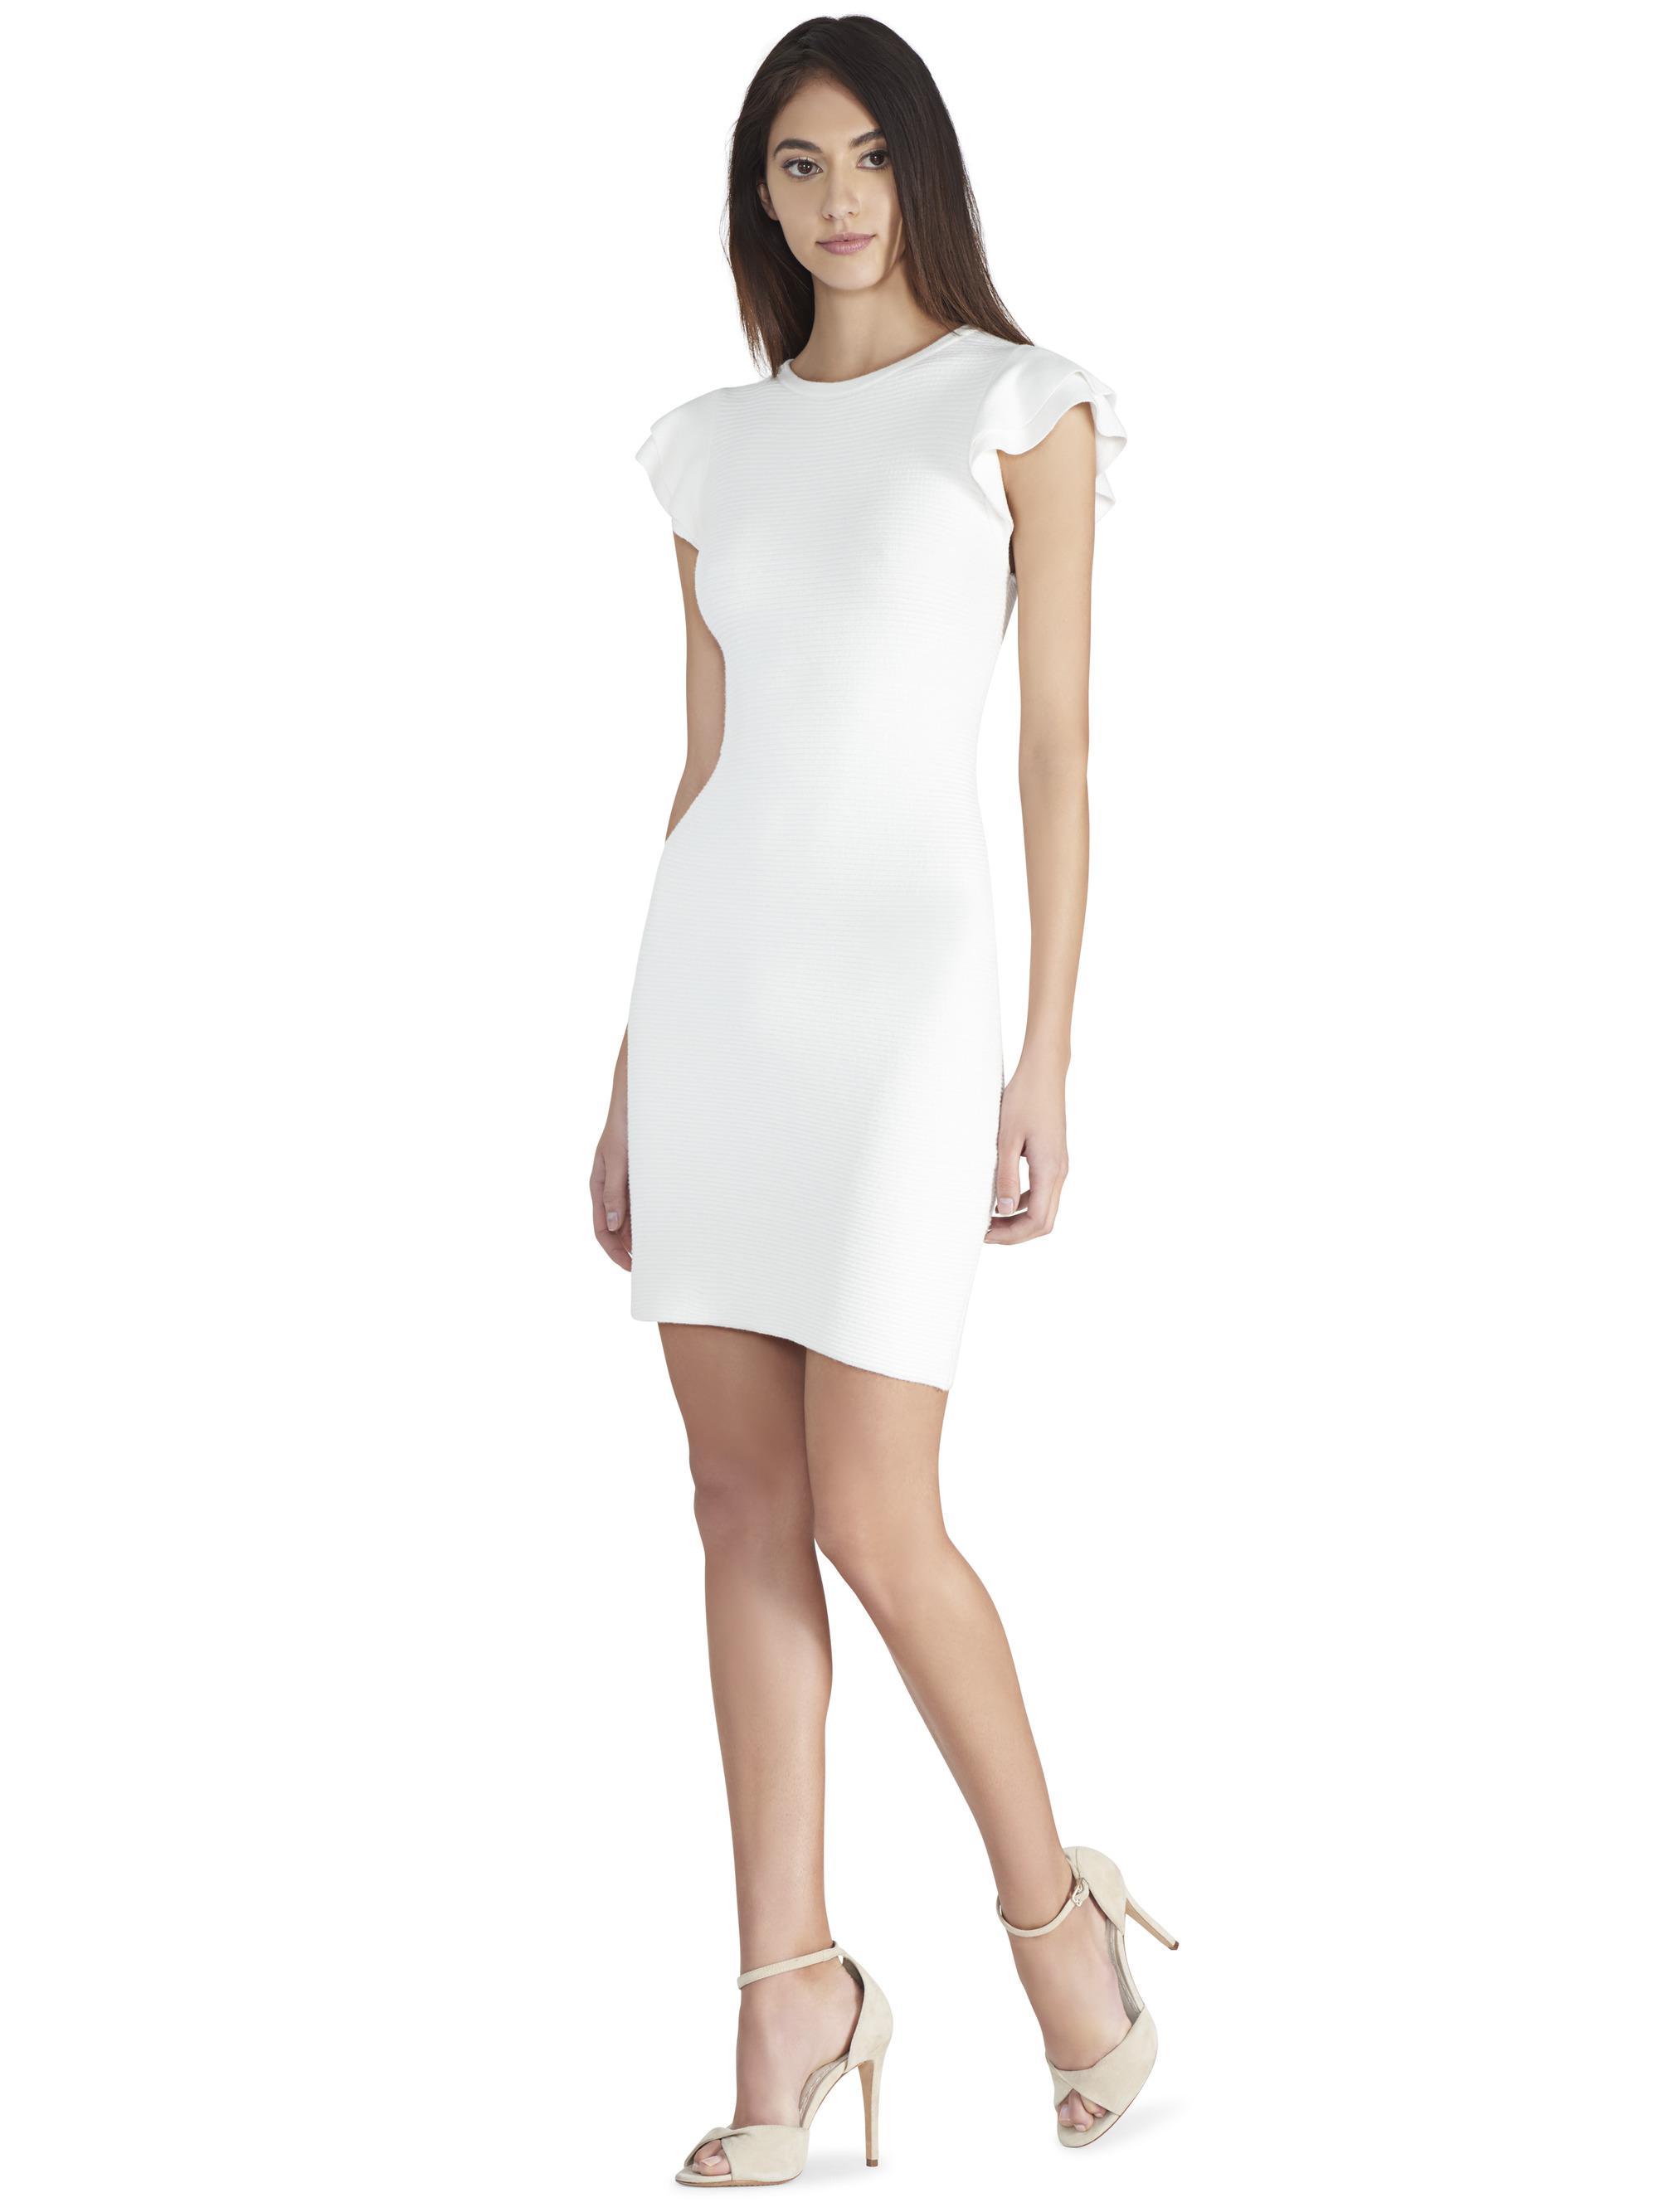 cc606a6ff8c Alice + Olivia Kellin Ruffle Sleeve Sweater Dress in White - Lyst